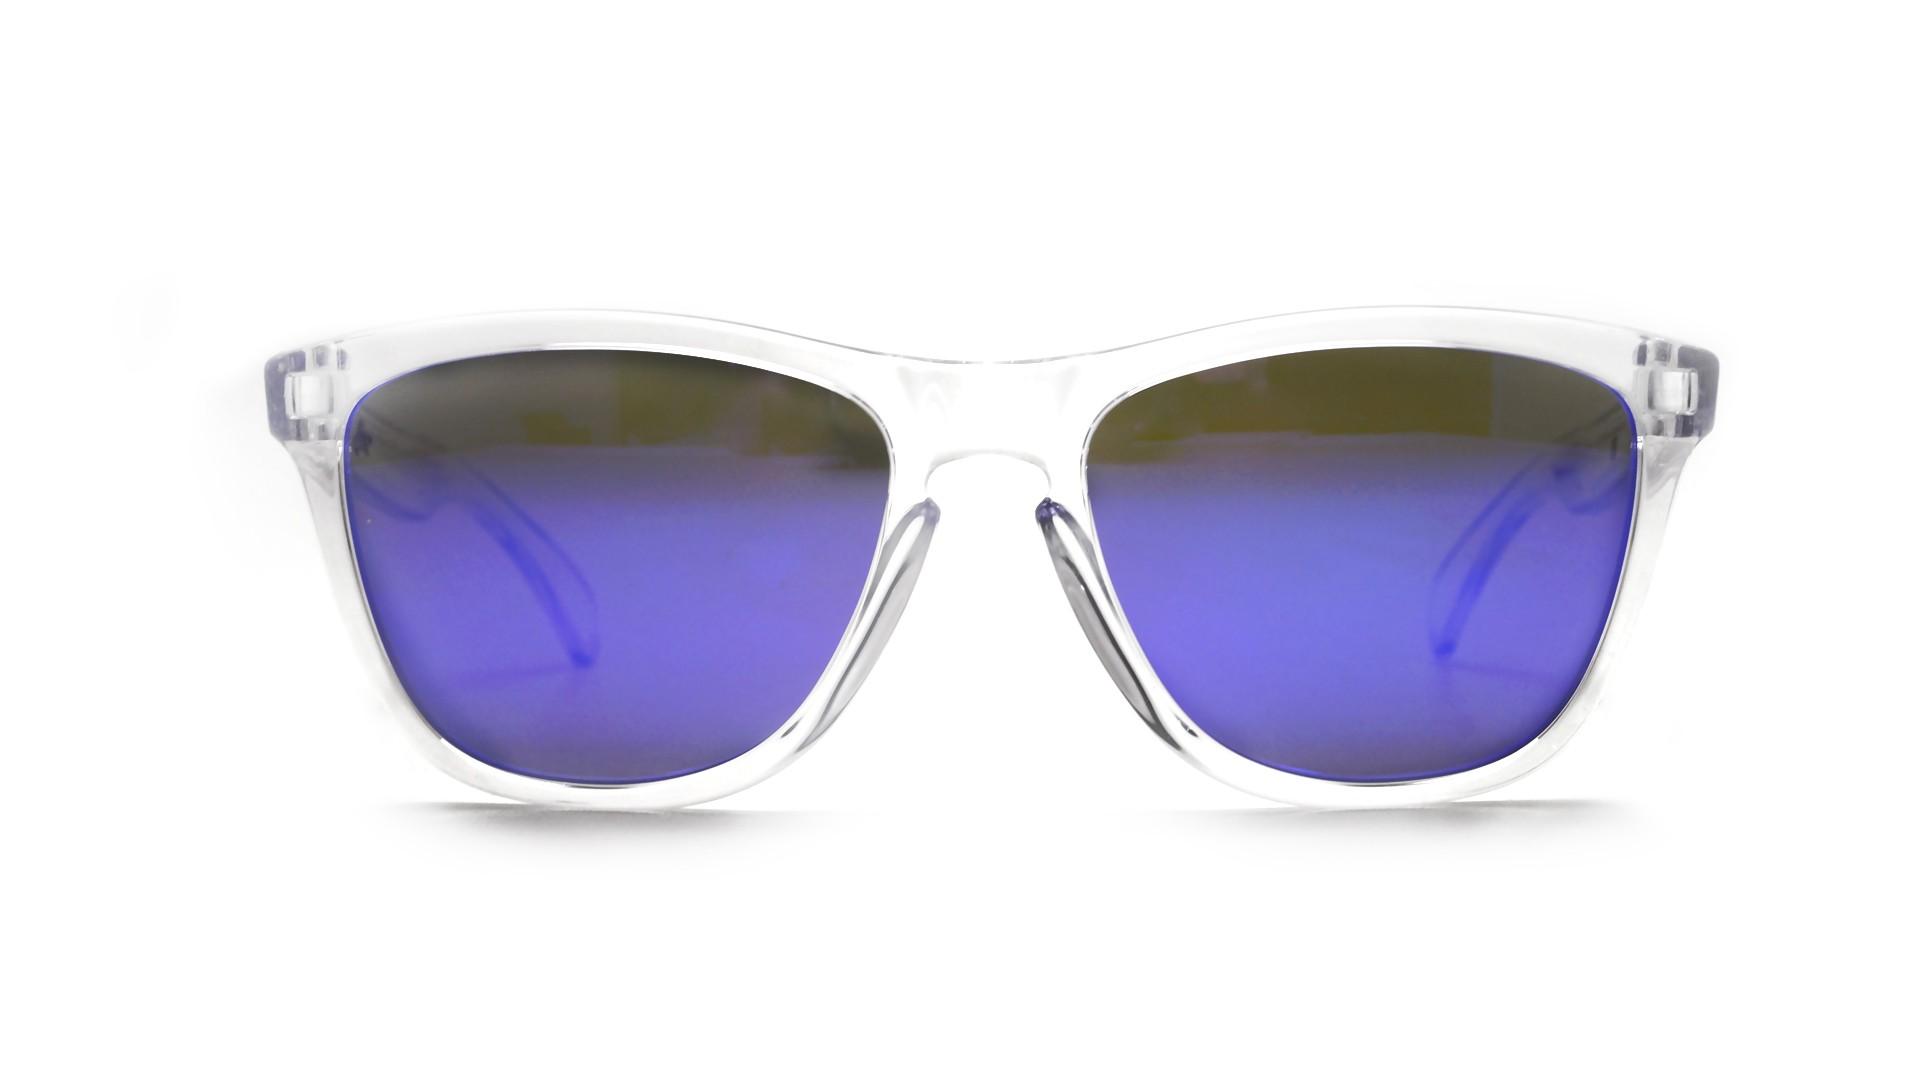 a36f28ef21 Sunglasses Oakley Frogskins Clear Iridium OO9013 24-305 55-17 Medium Mirror